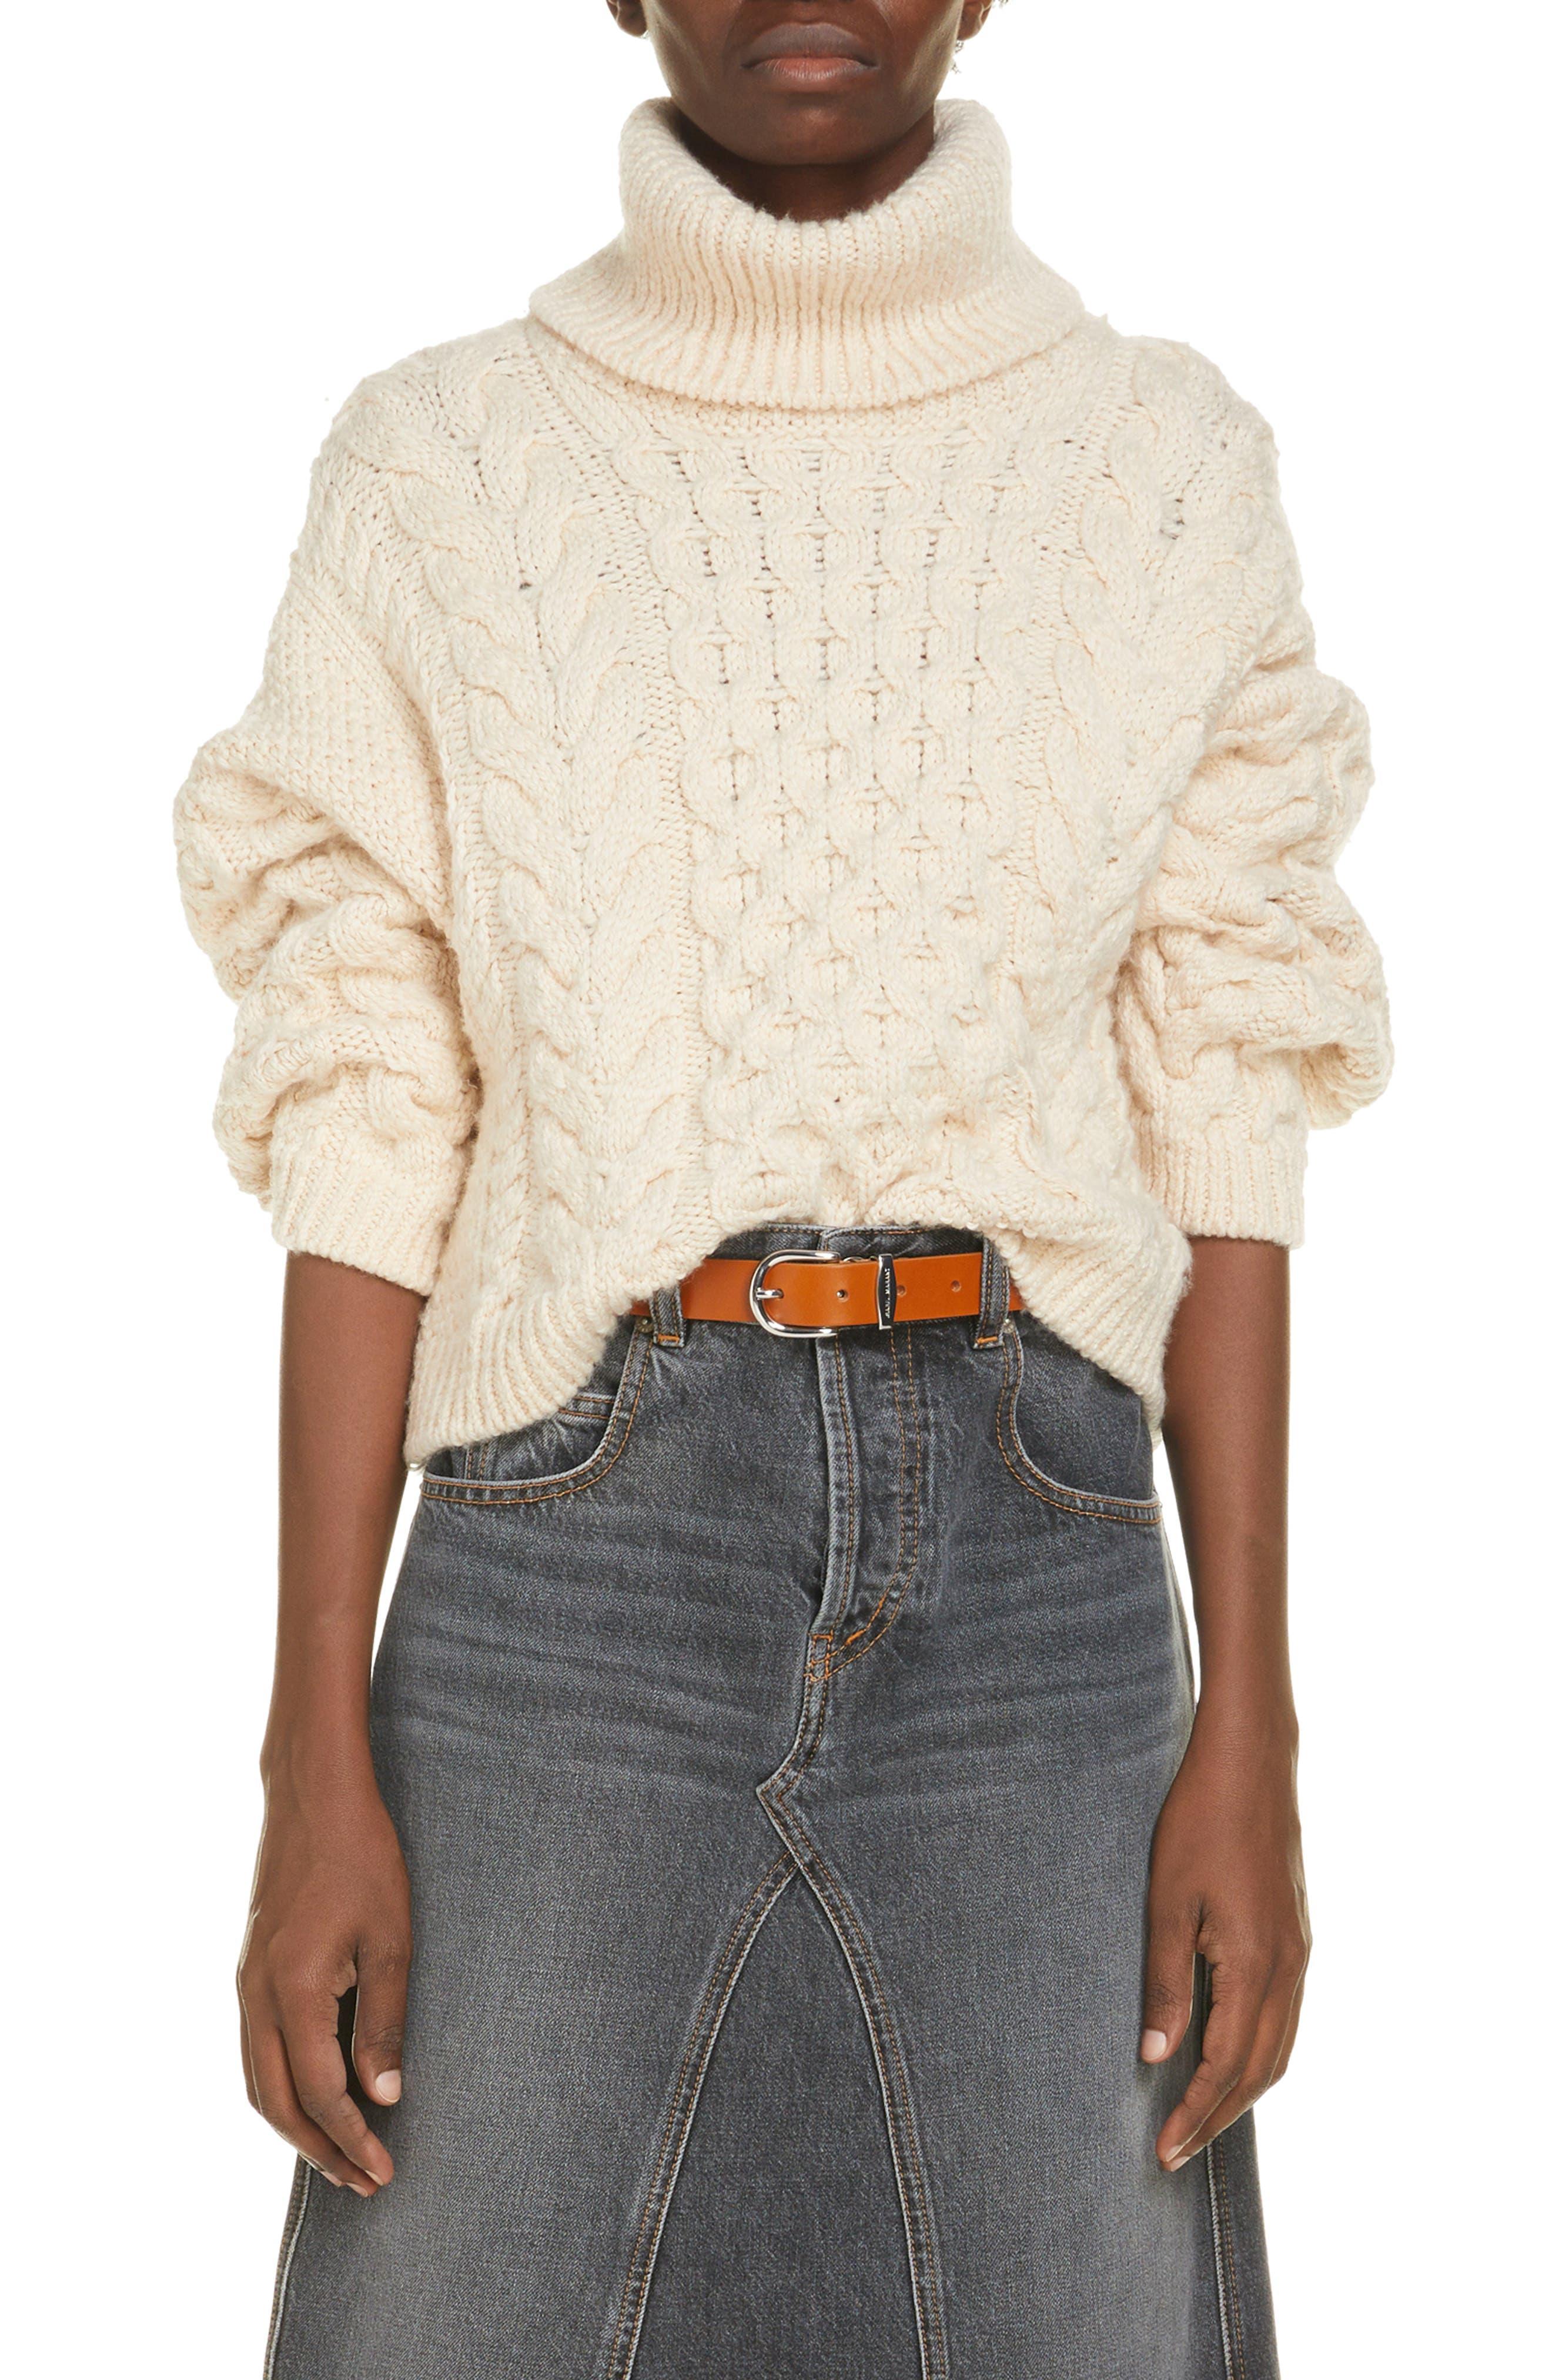 Isabel Marant Etoile Ingrid Wool Blend Turtleneck Sweater